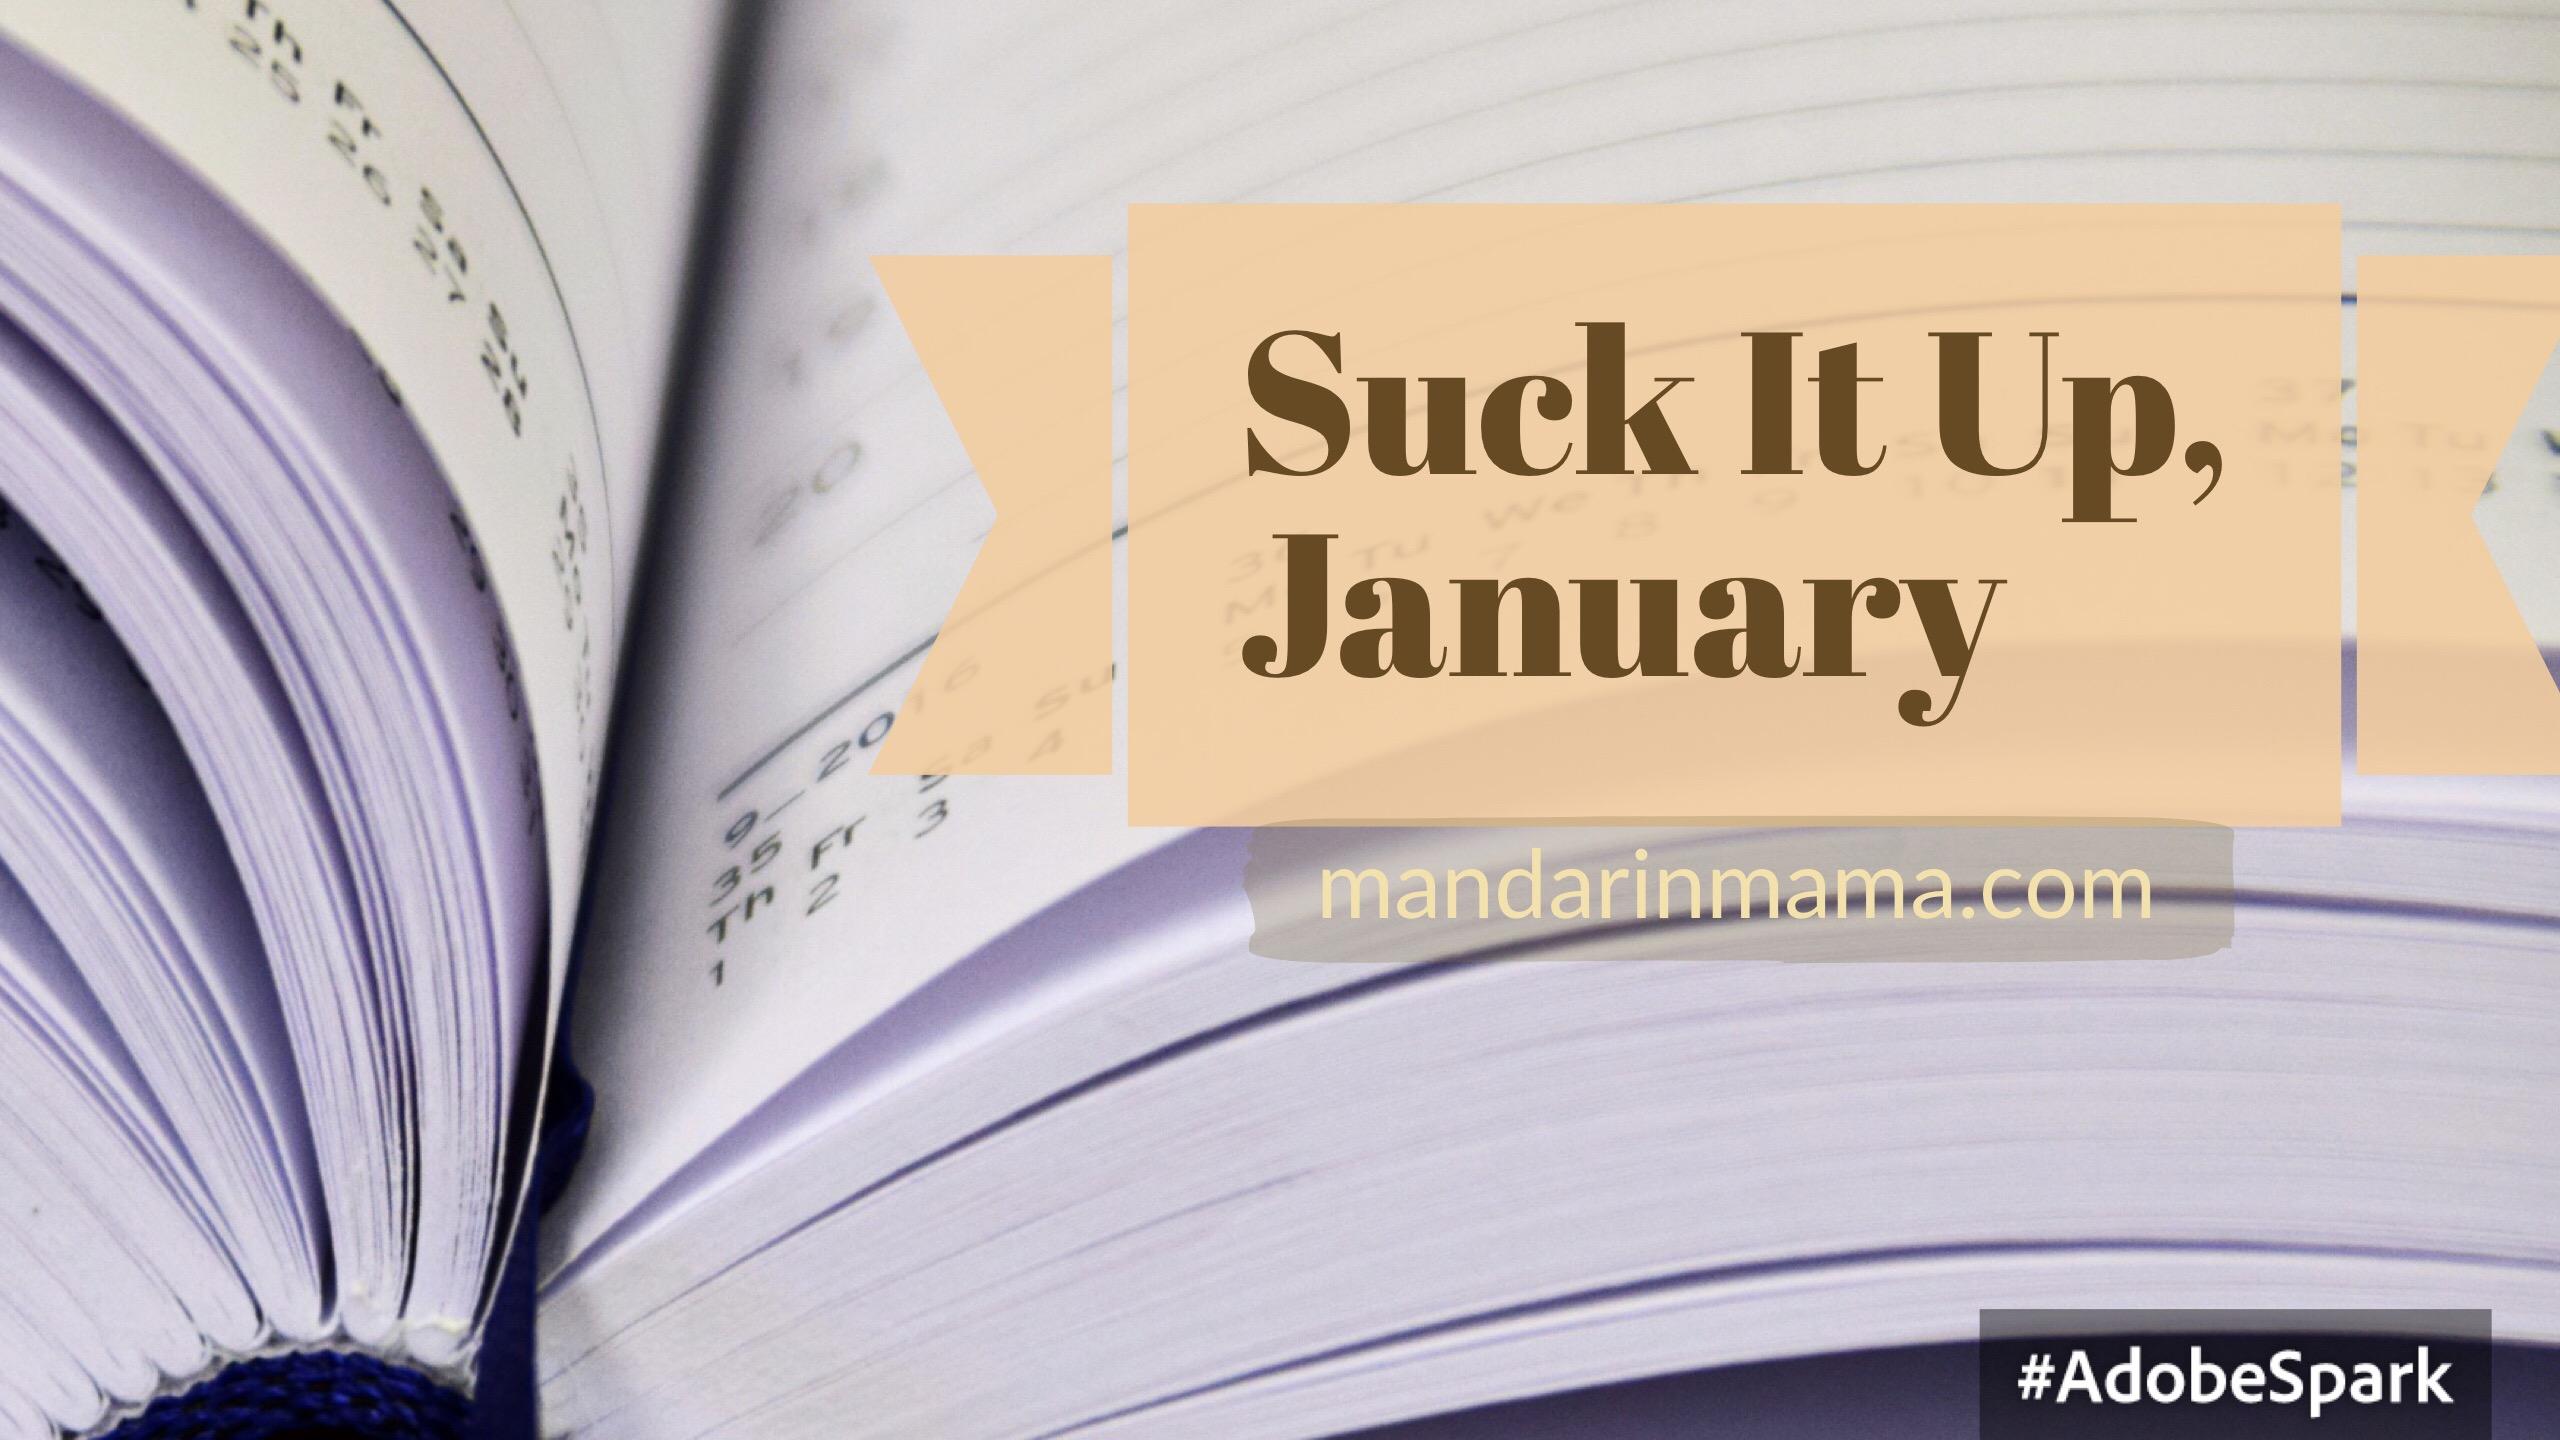 Suck It Up, January